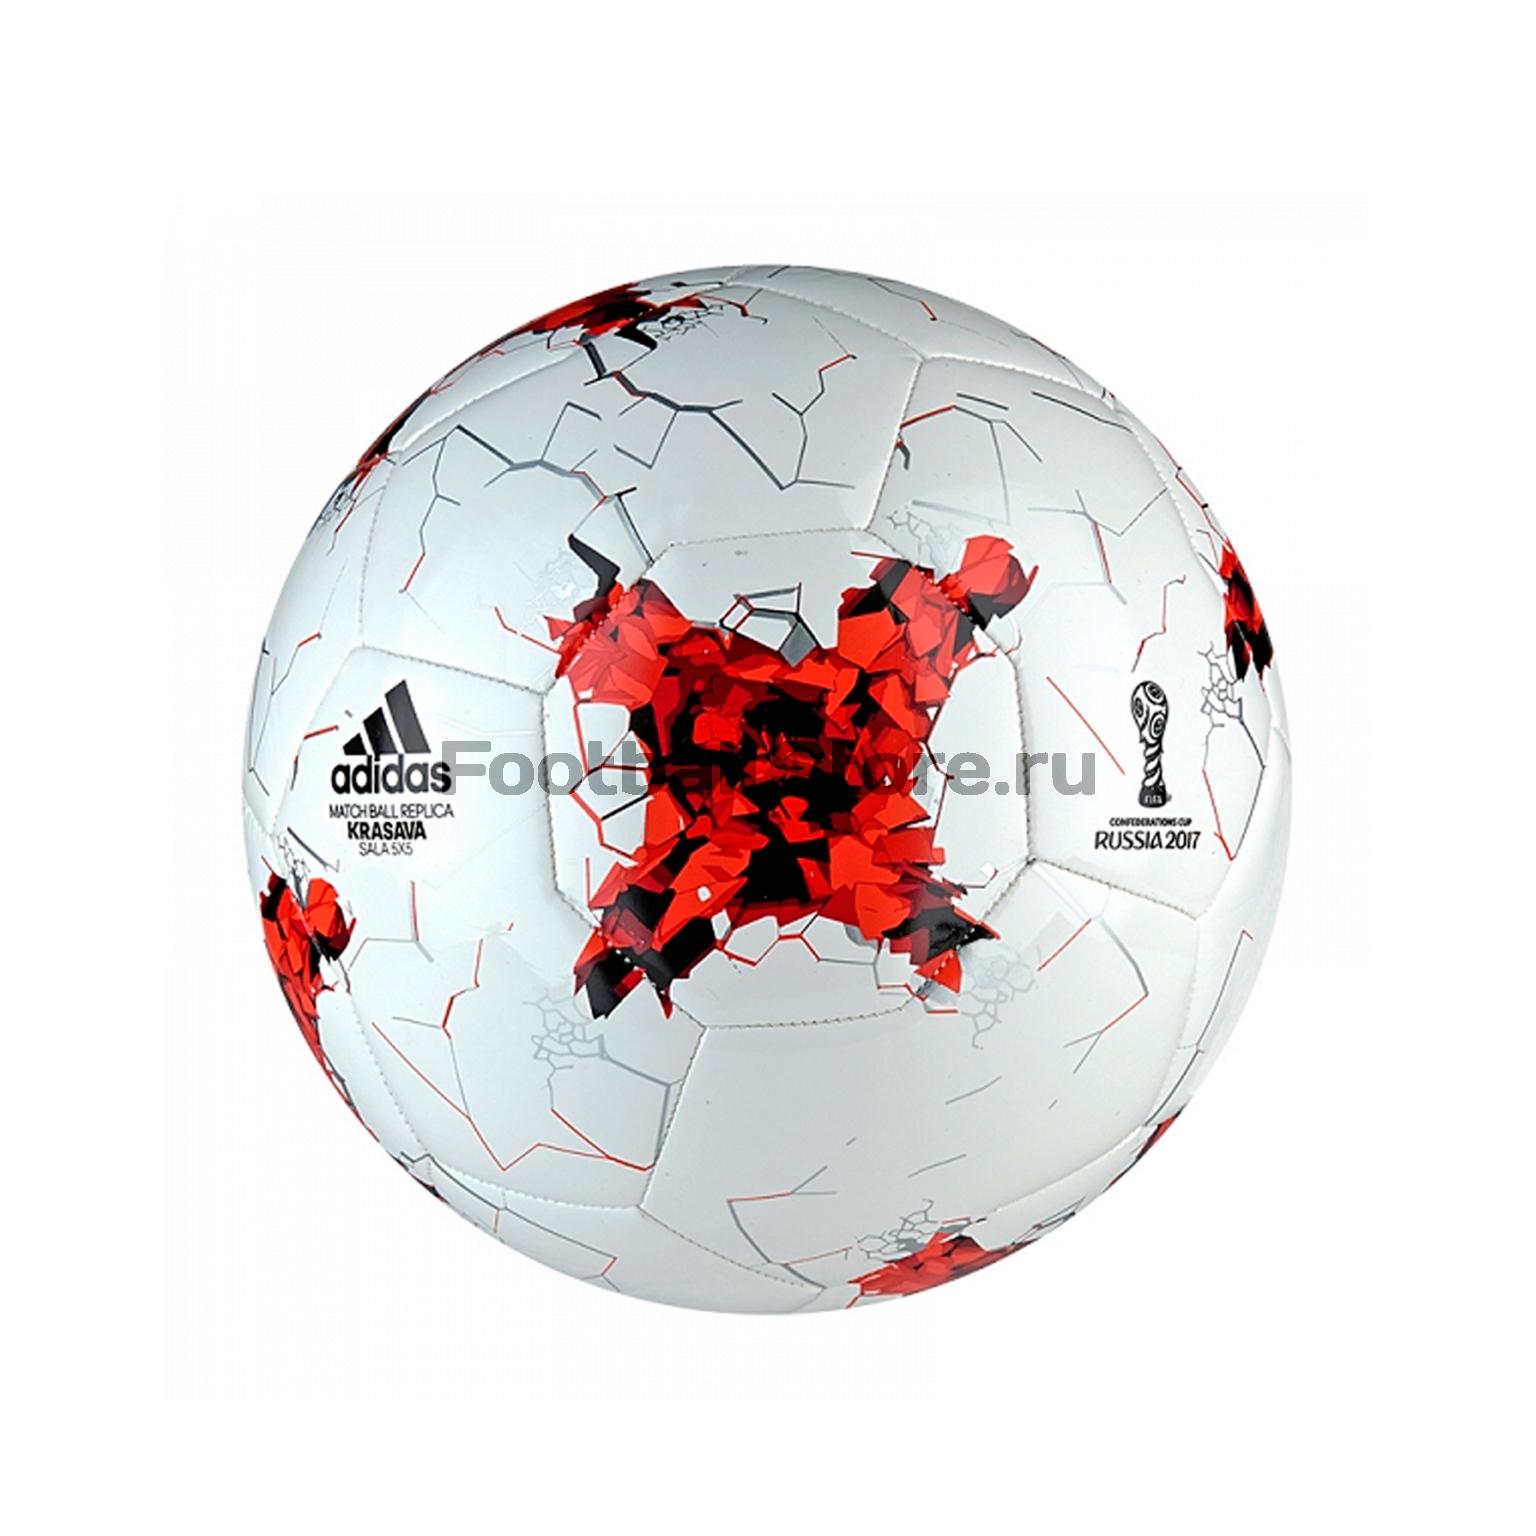 Adidas Мяч Adidas Confed Sala 5*5 AZ3200 adidas мяч adidas offpitch sala ao3271